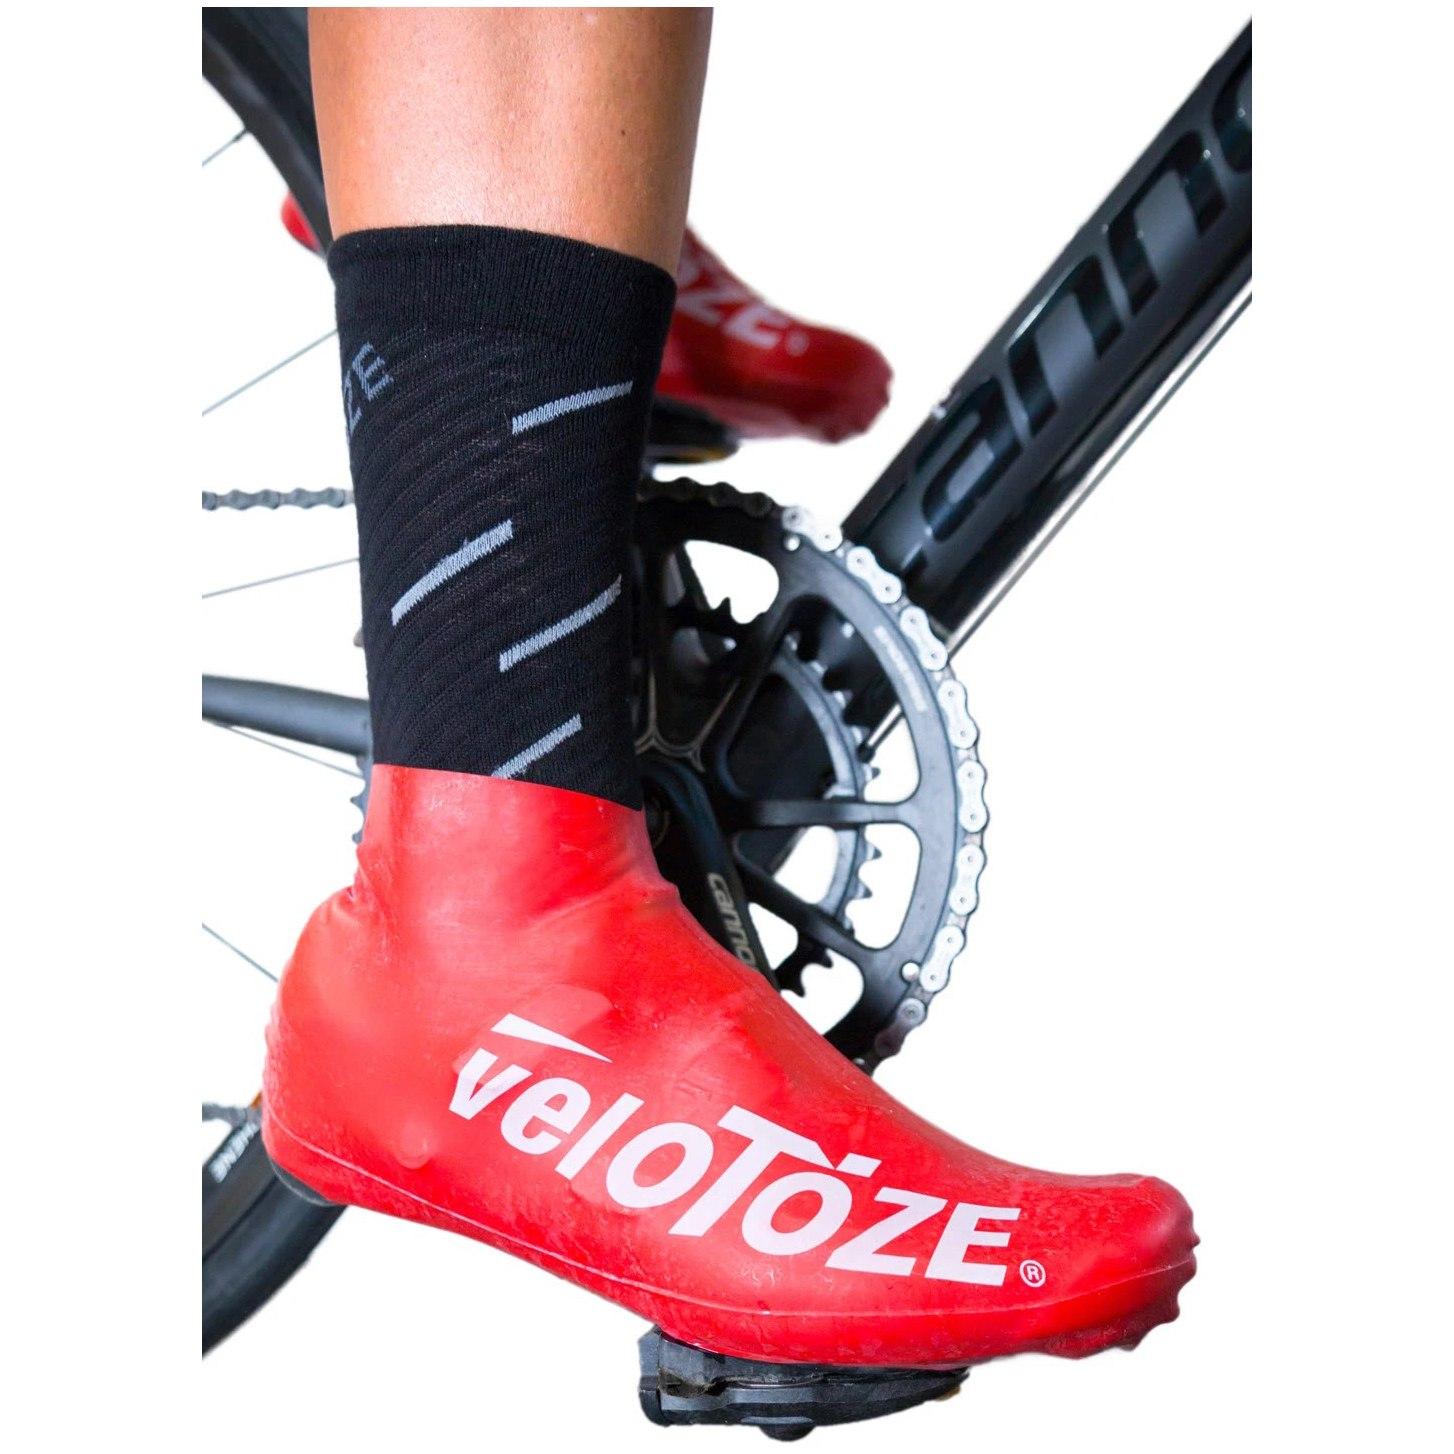 Bild von veloToze Short Shoe Cover Road 2.0 - Überschuh Kurz - black